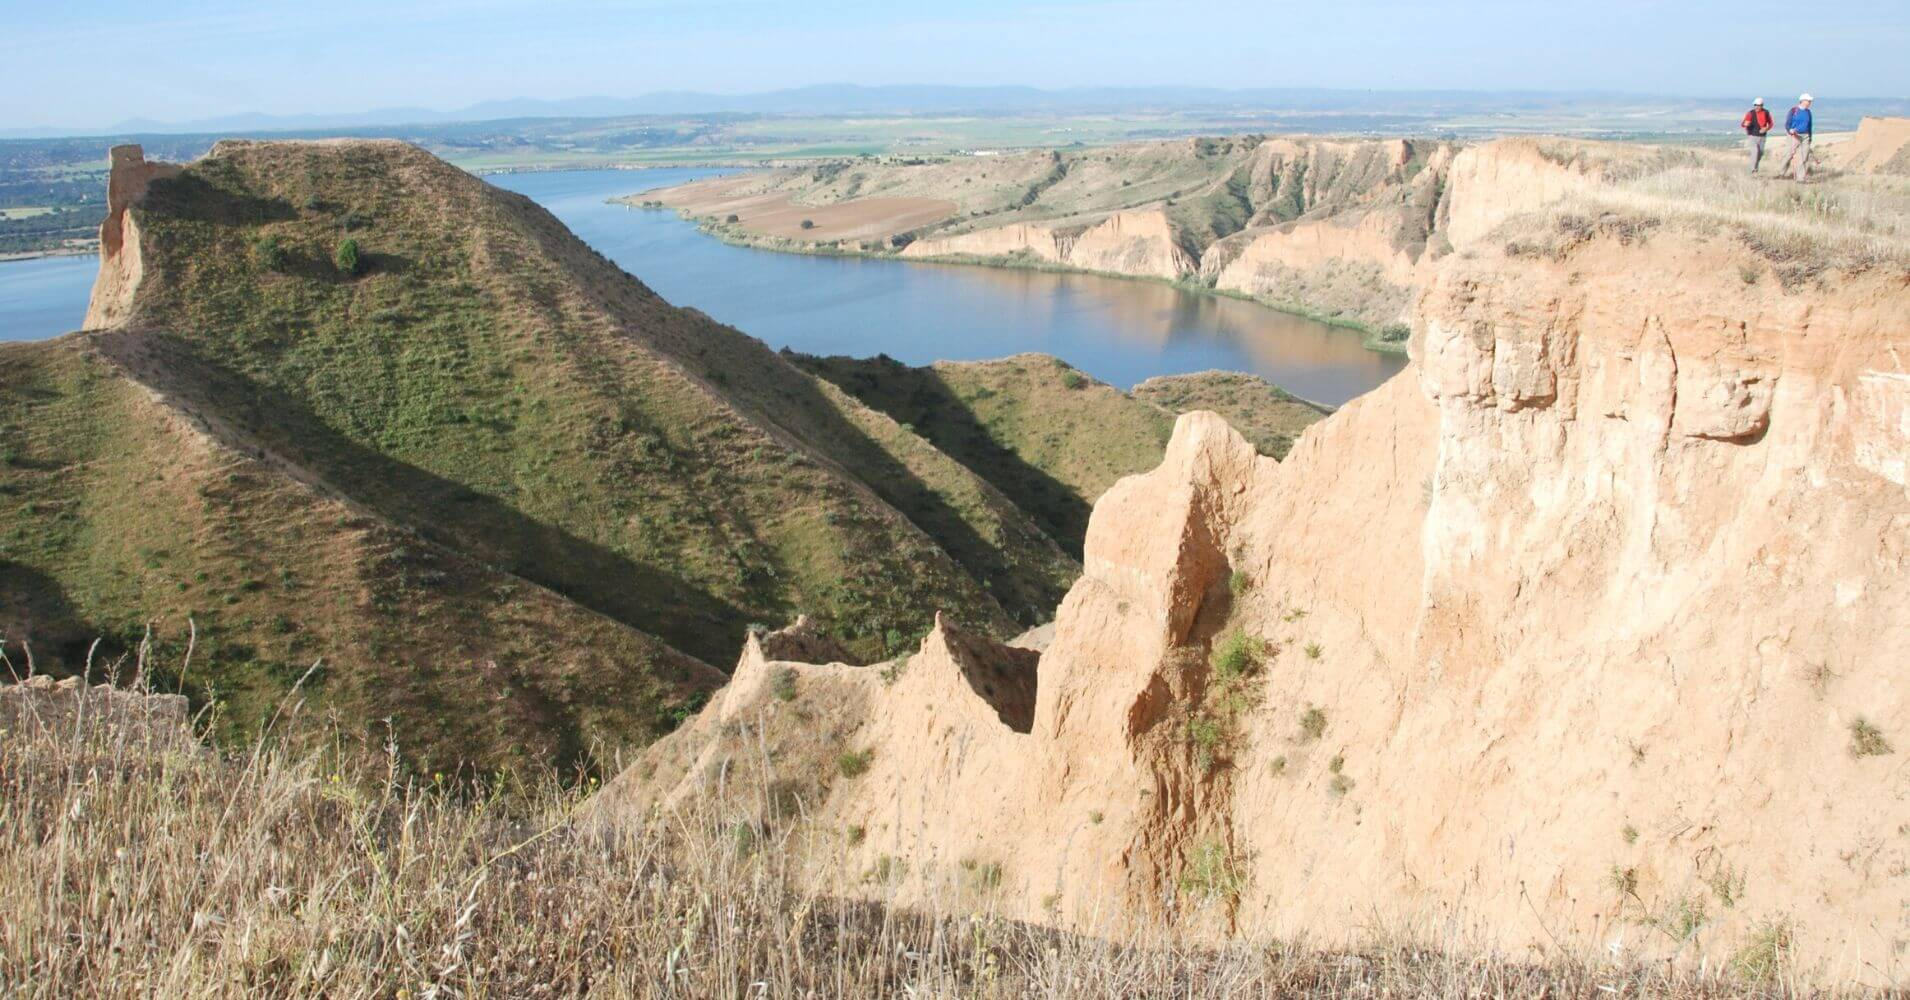 Ruta Senderismo del borde de las Barrancas de Castrejón. Burujón. Toledo, Castilla la Mancha.